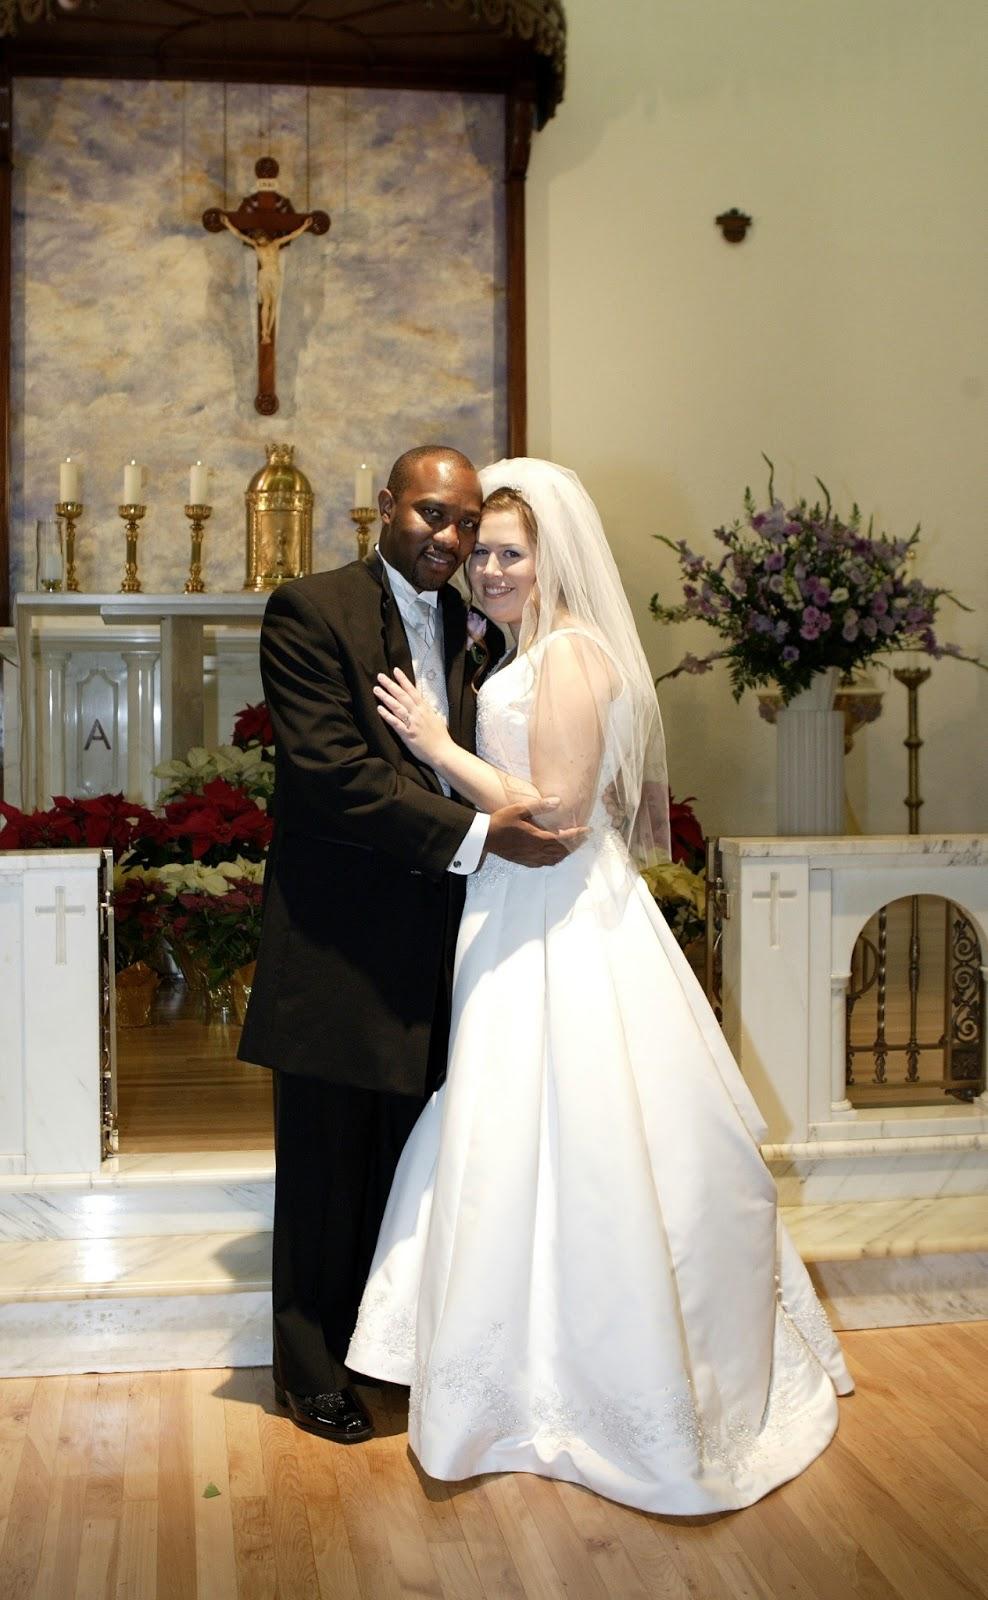 Cross Culture Of Cross Cultural Marriage